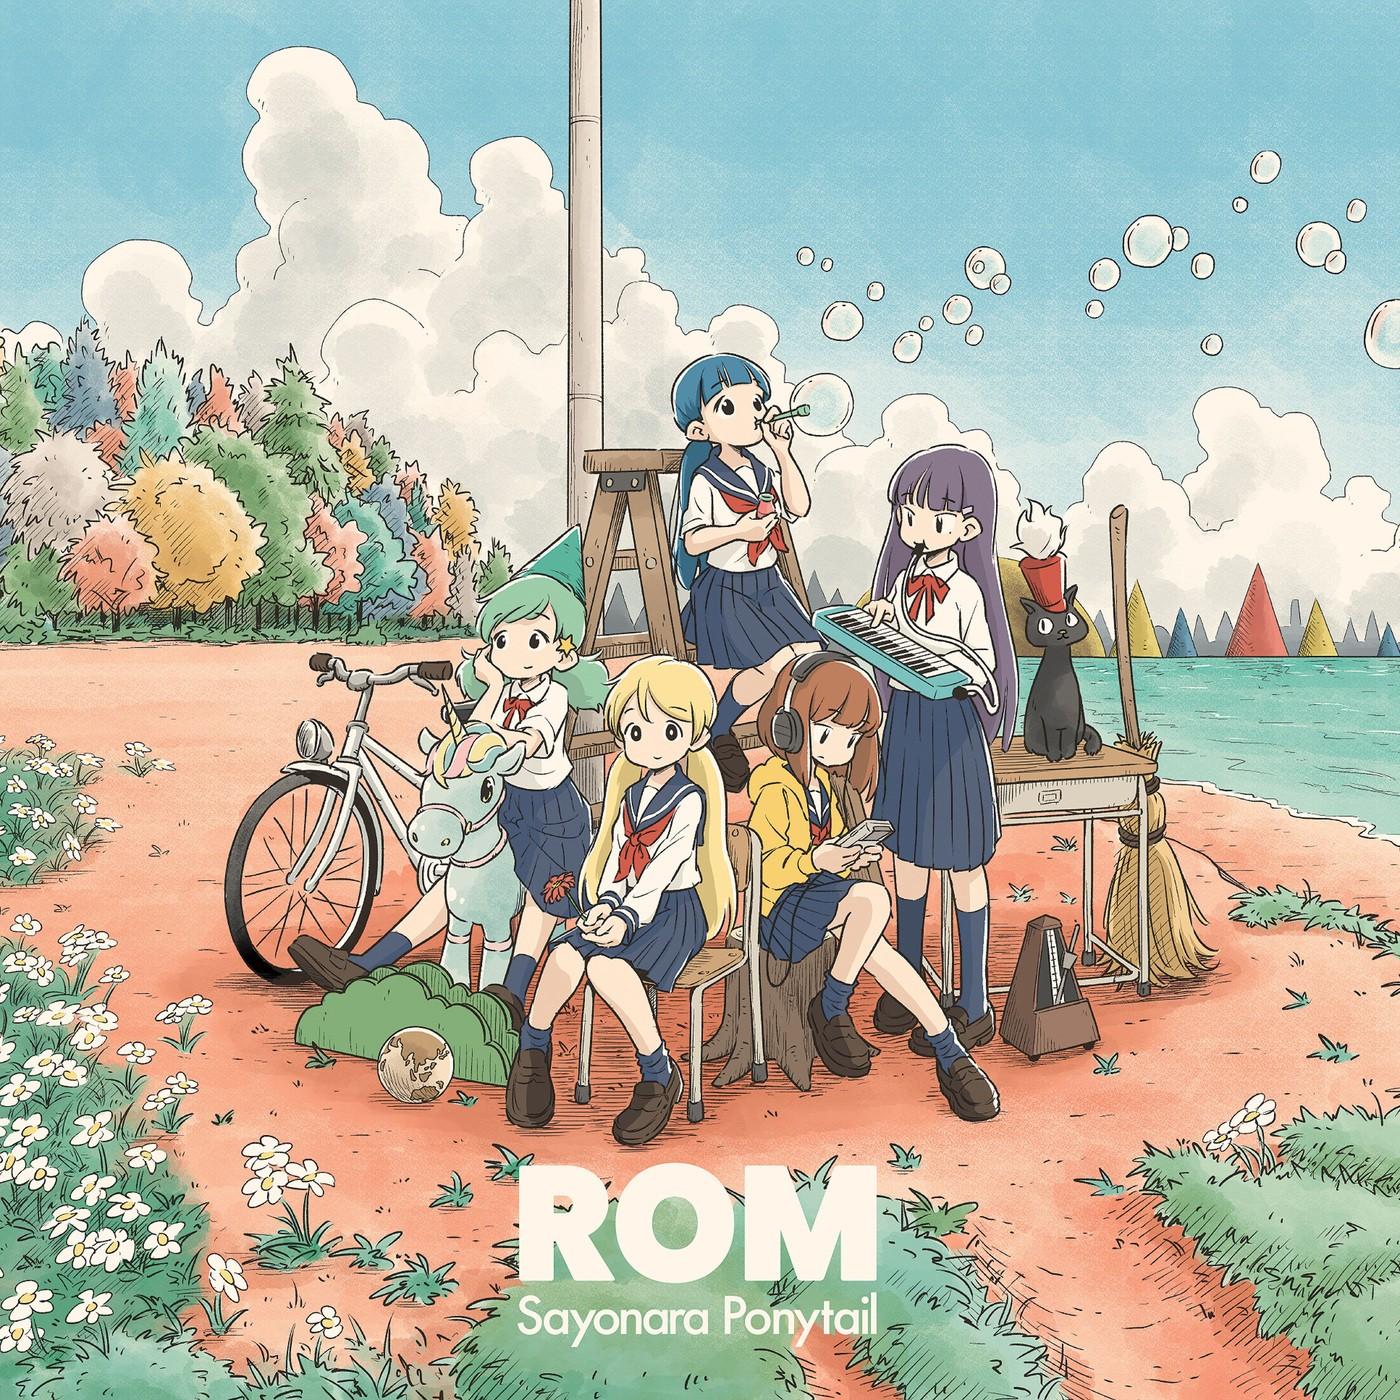 Sayonara Ponytail (さよならポニーテール) – ROM [FLAC + MP3 320 / WEB] [2019.11.13]